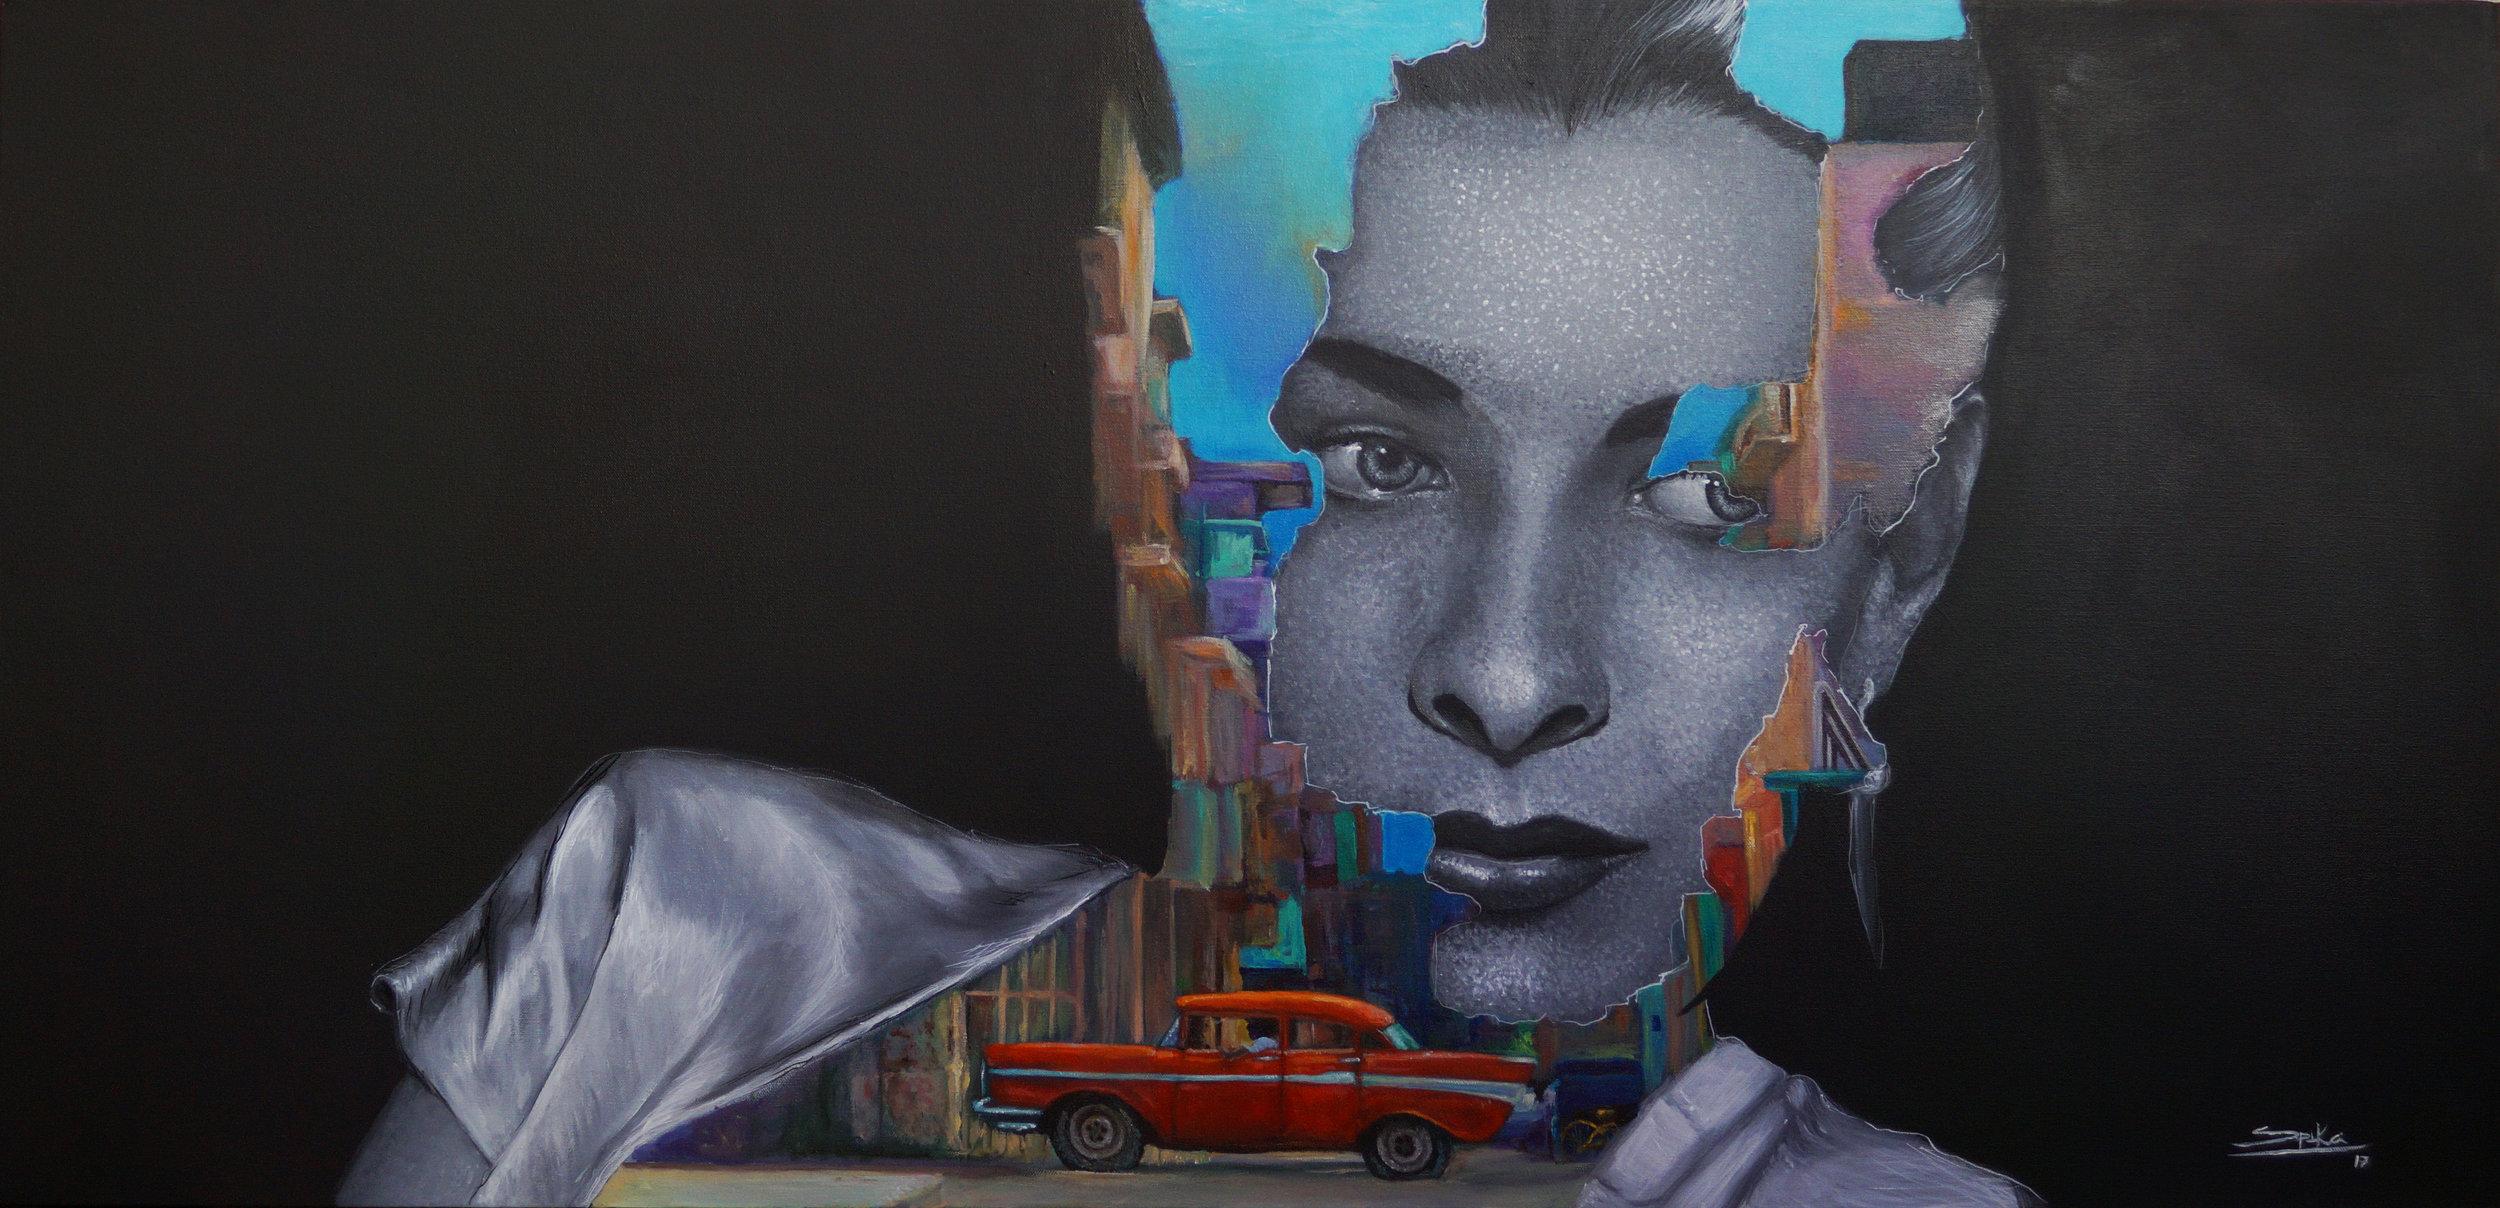 Natalia Acrylic-canvas 147x71cm 2017.jpg